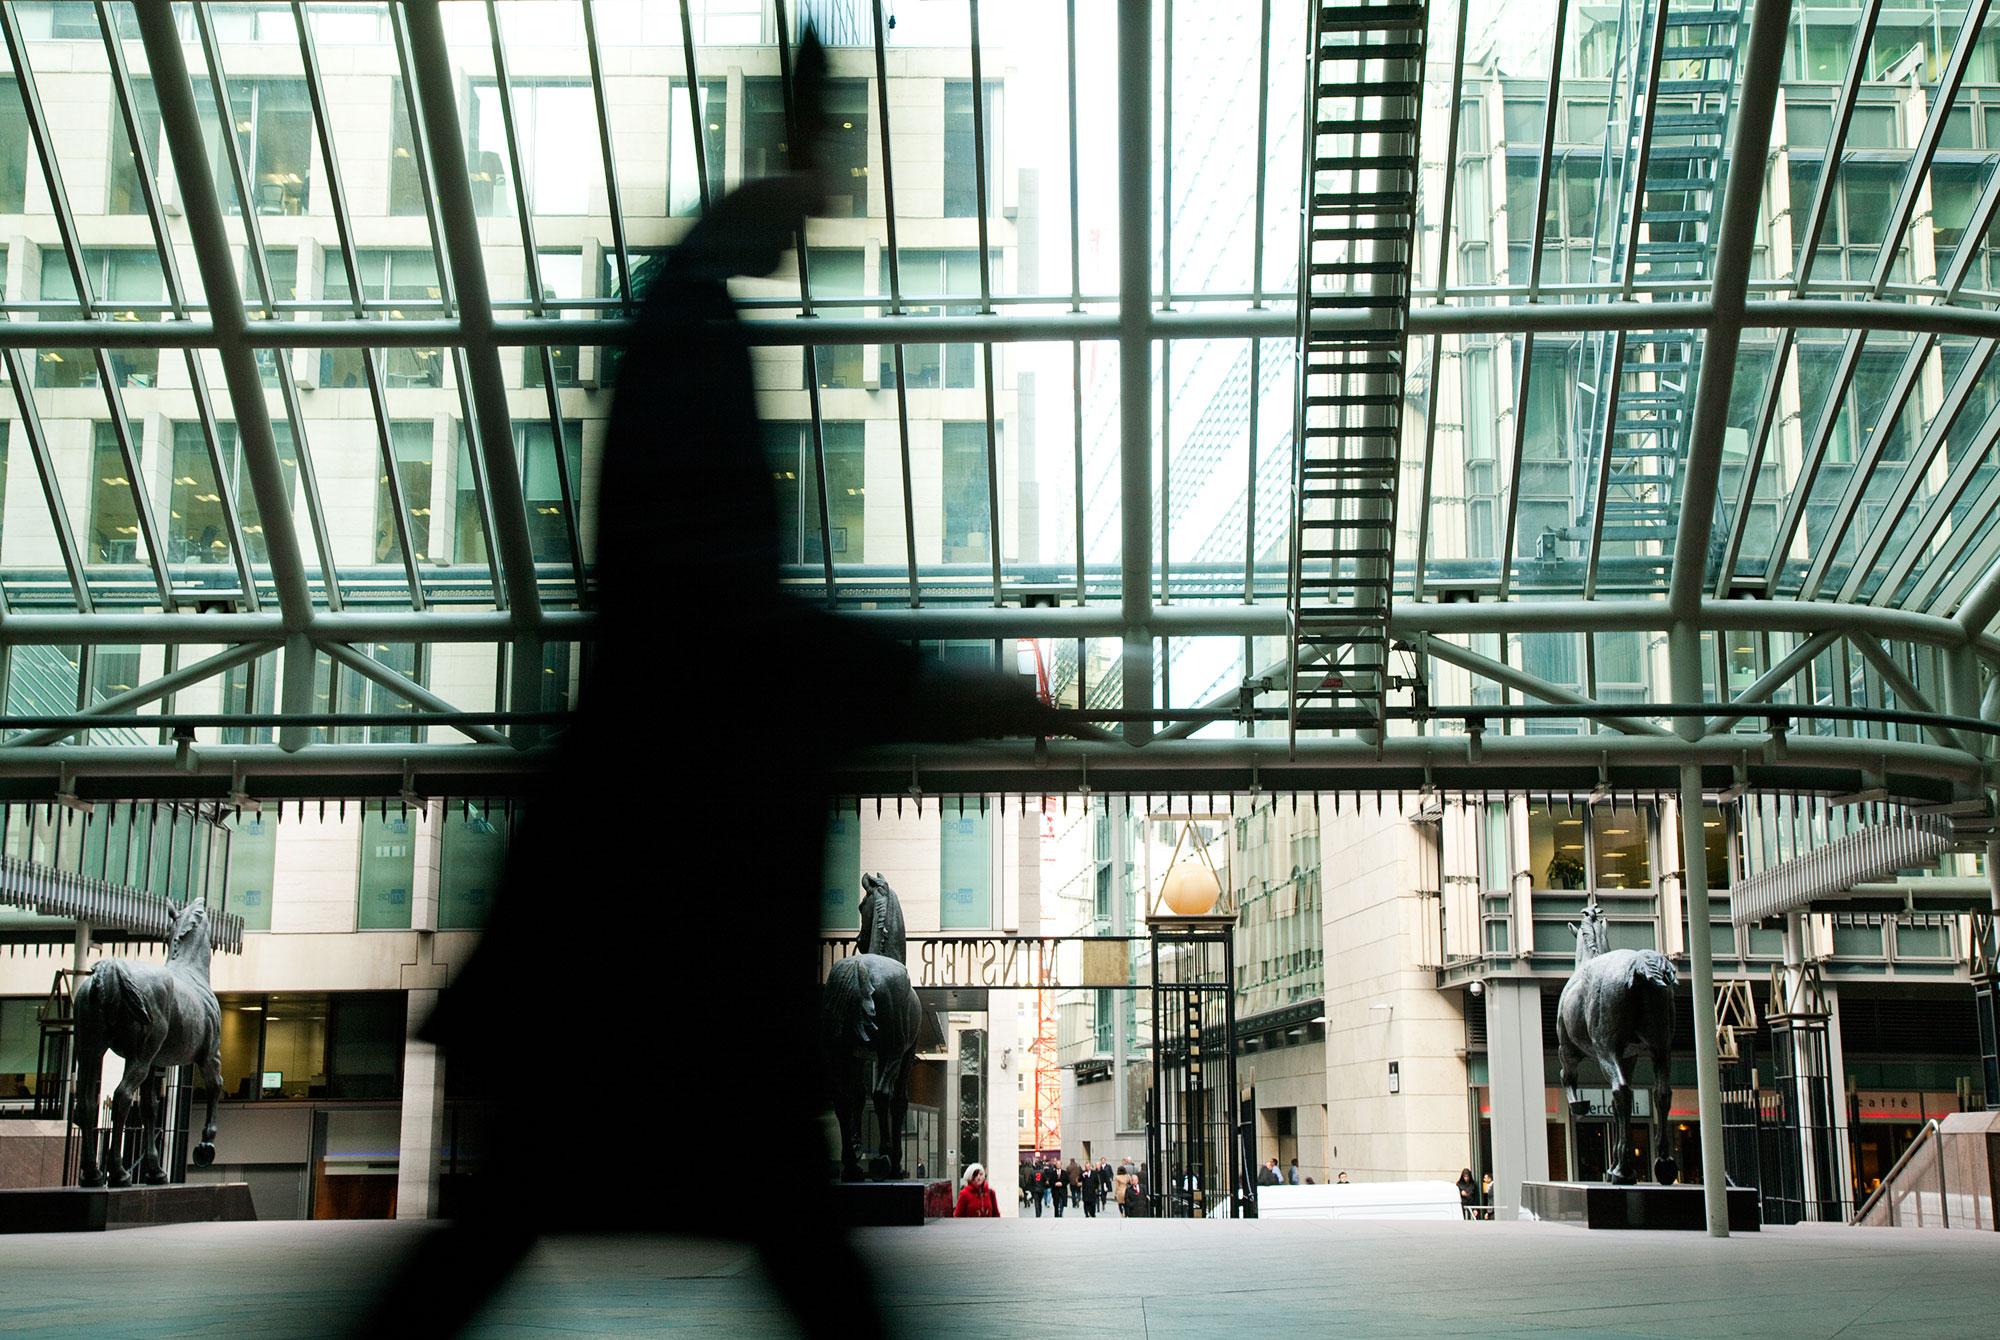 LM_London-2012-day02_291.jpg